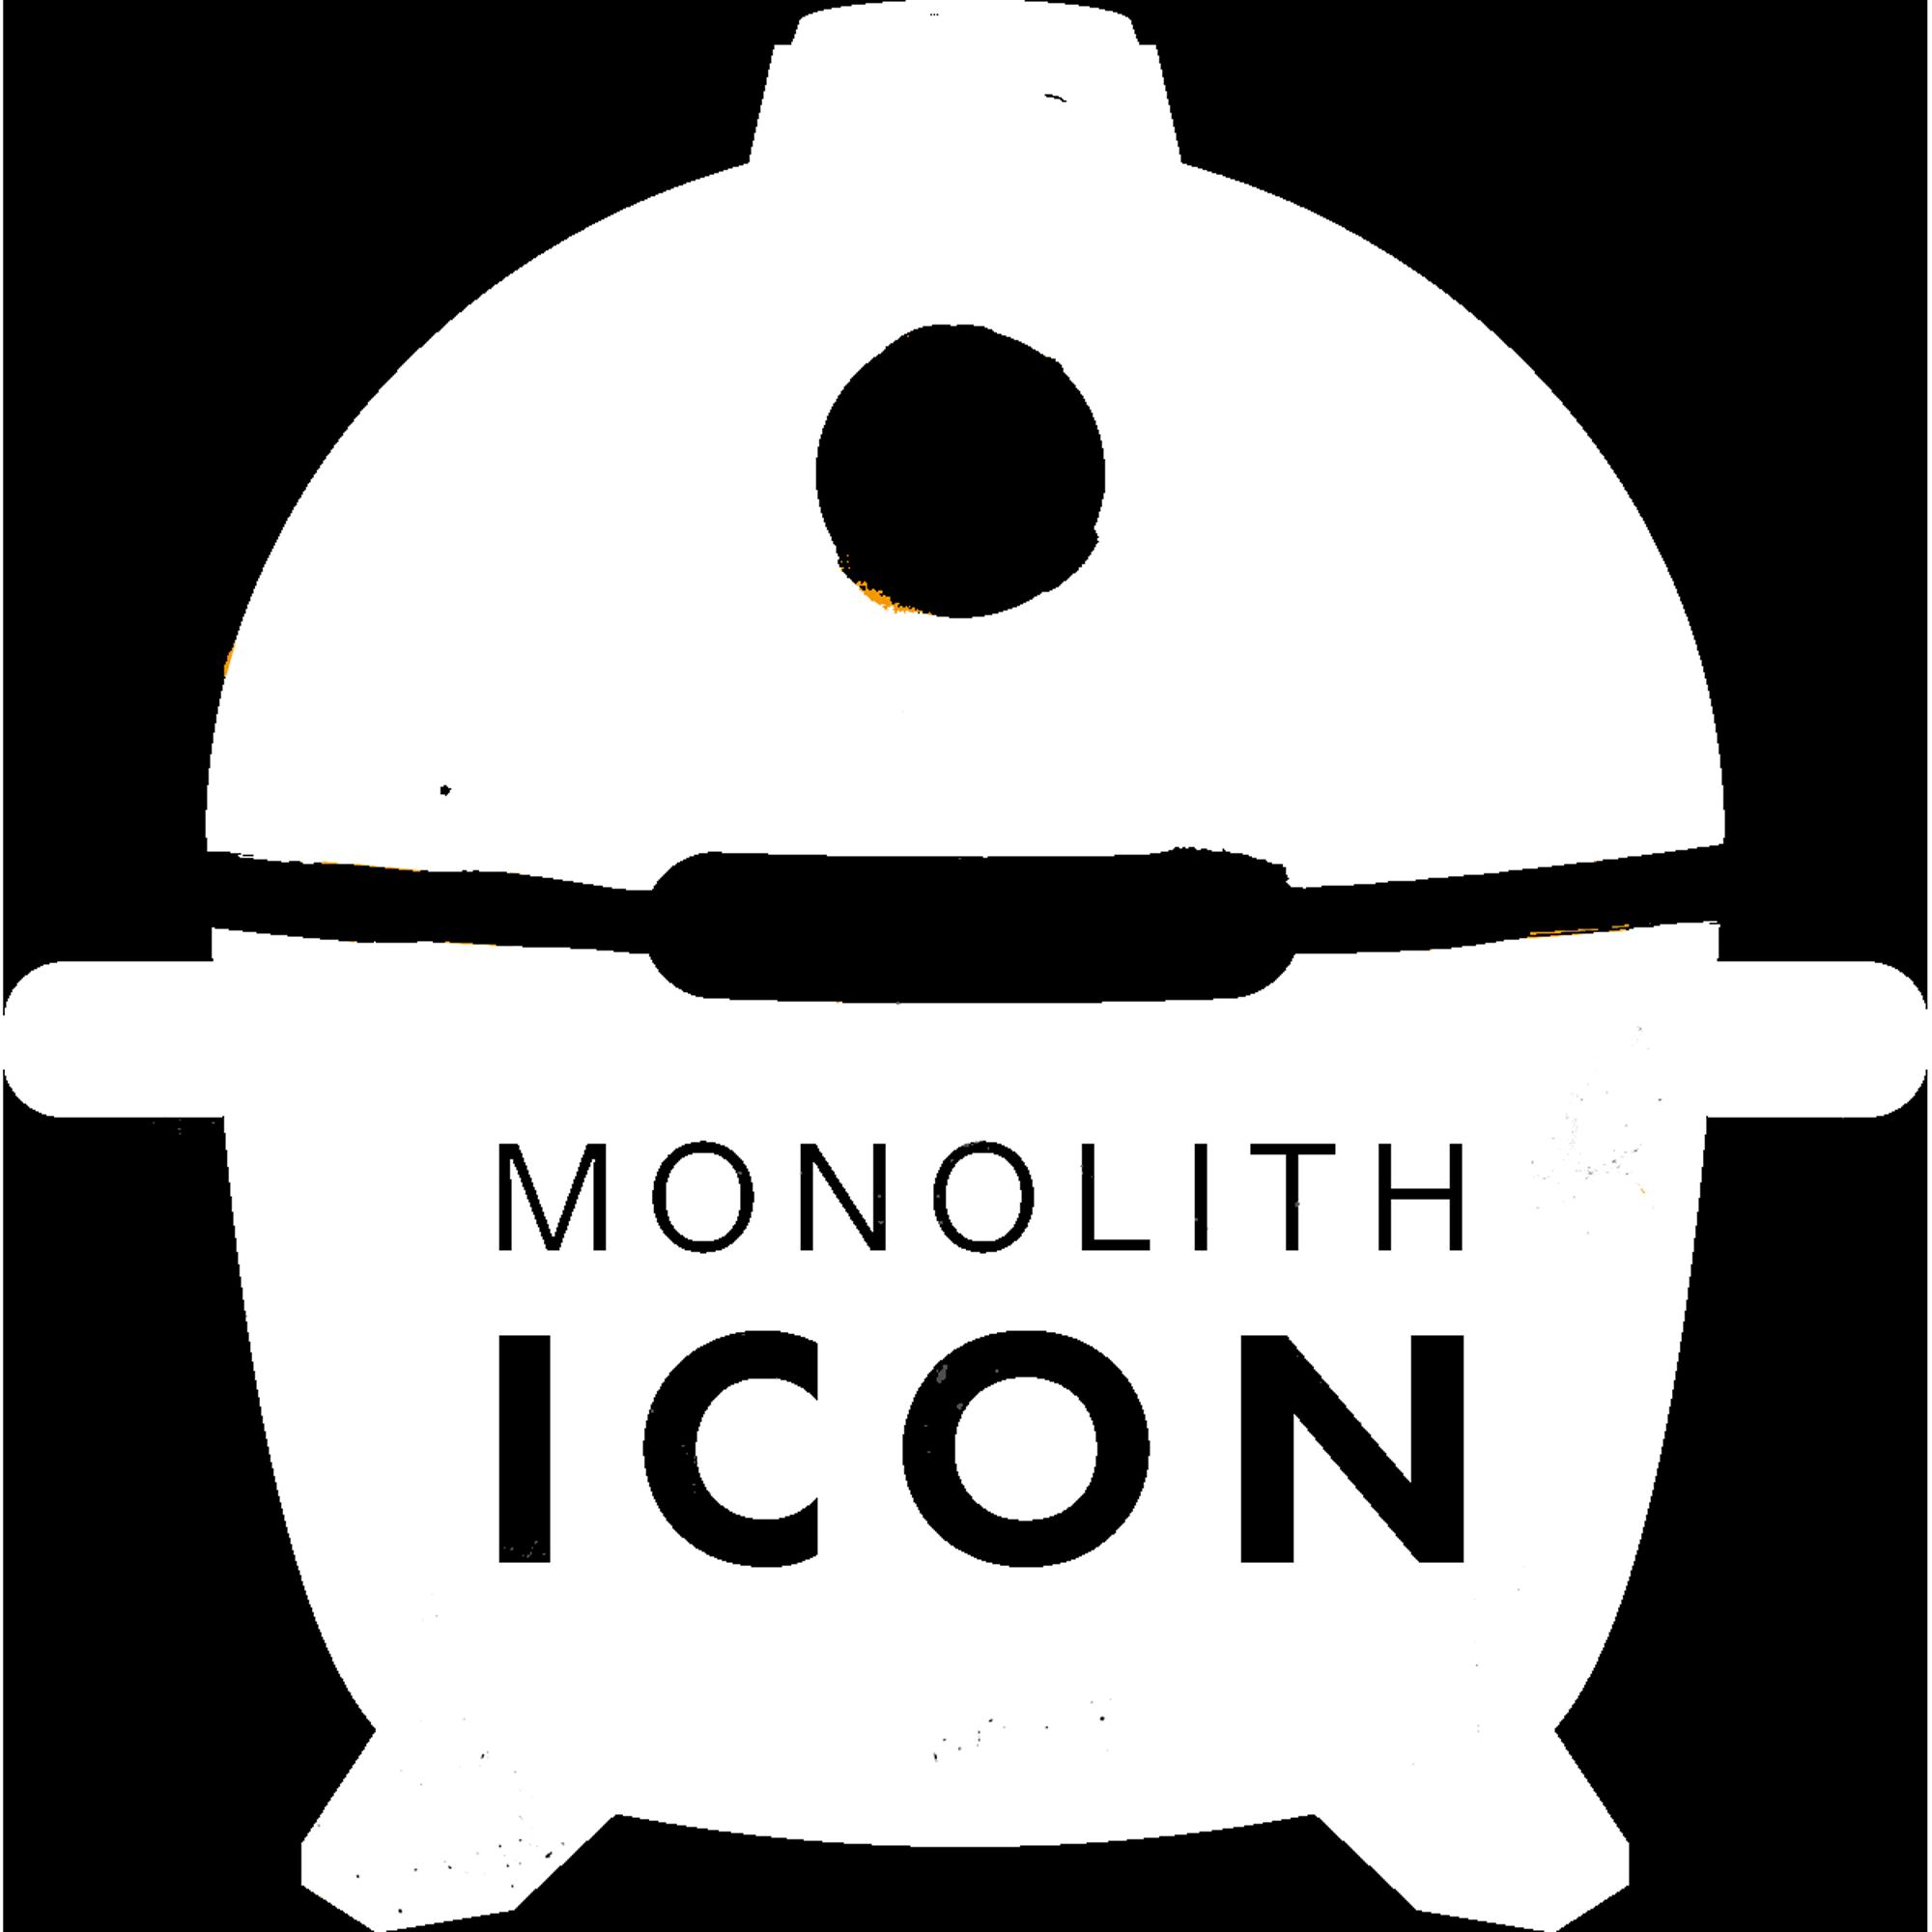 Monolith Icon Grill